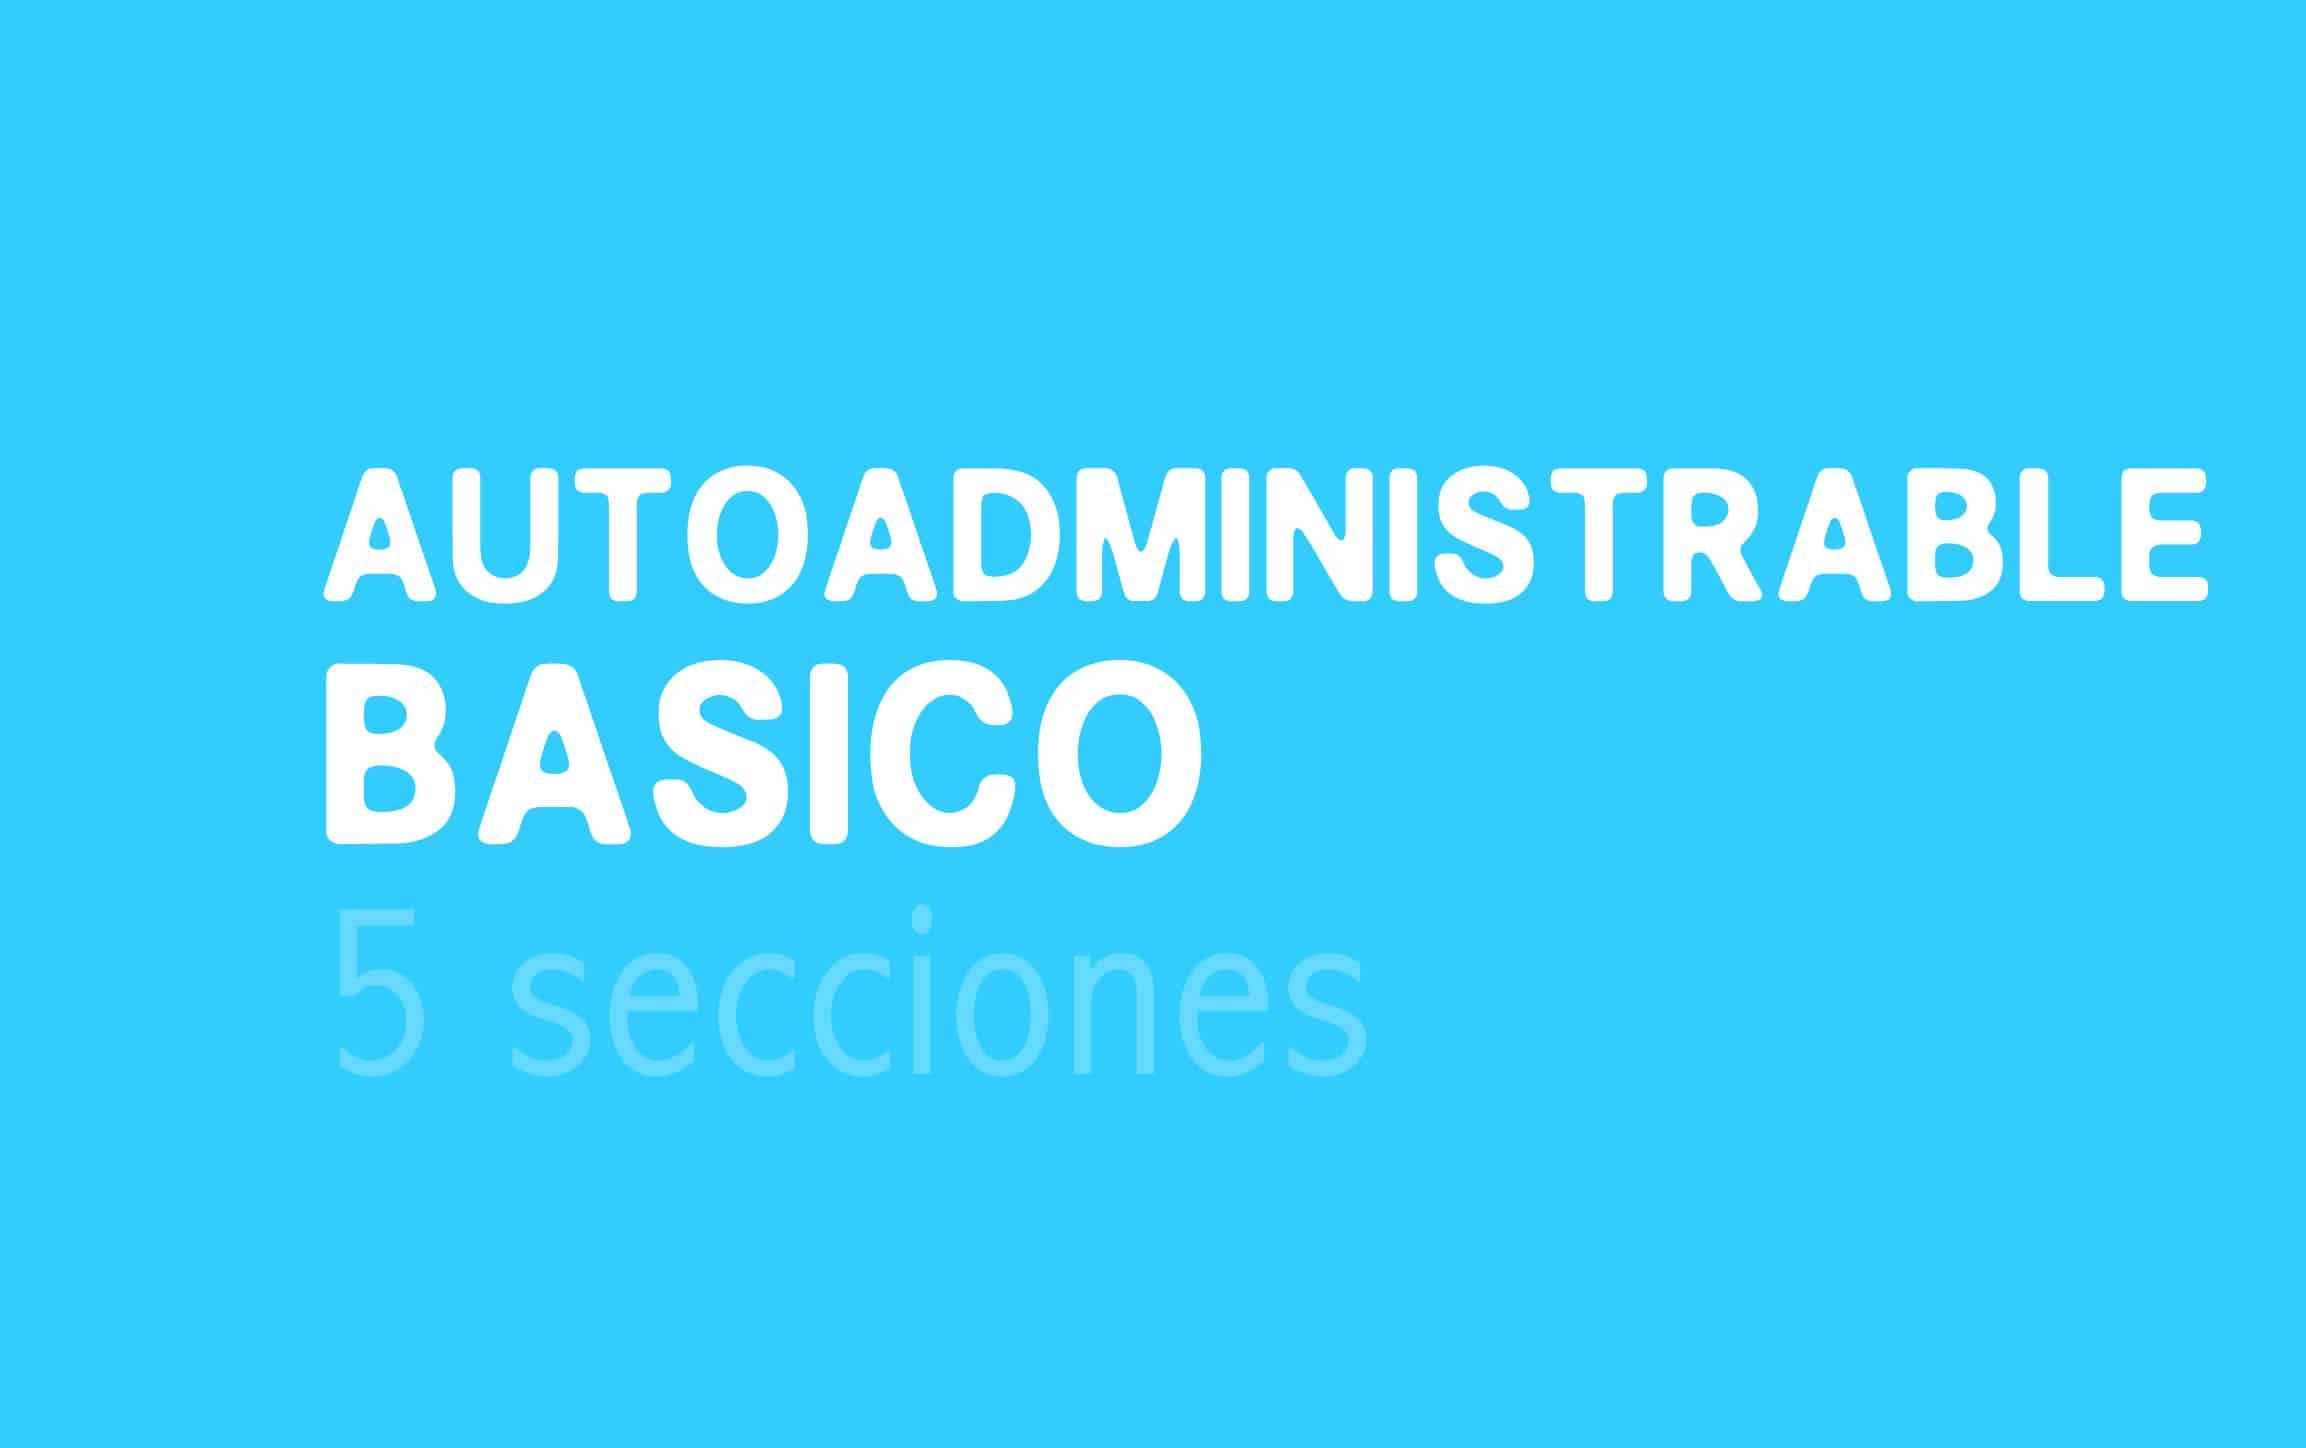 Plan de diseño web Autoadministrable básico